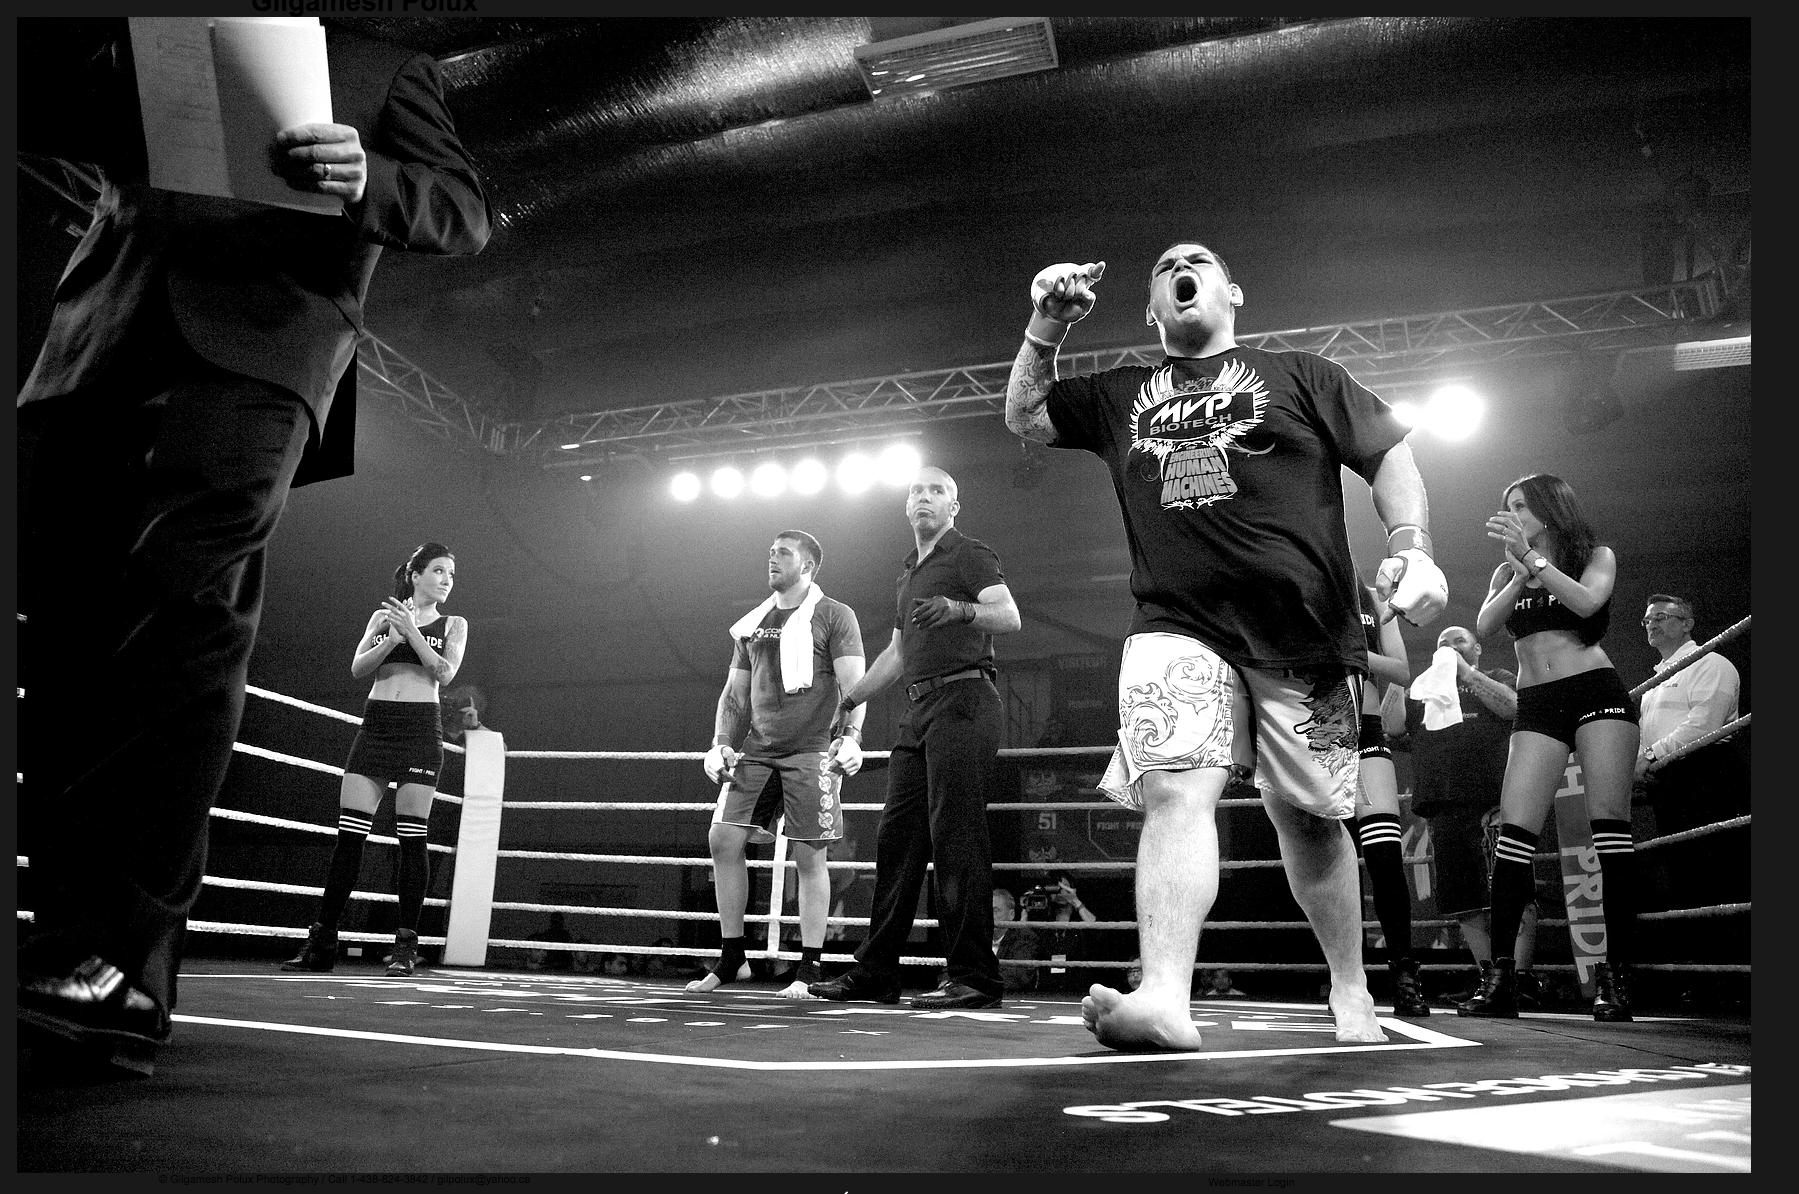 Sports photography | Gilgamesh Polux